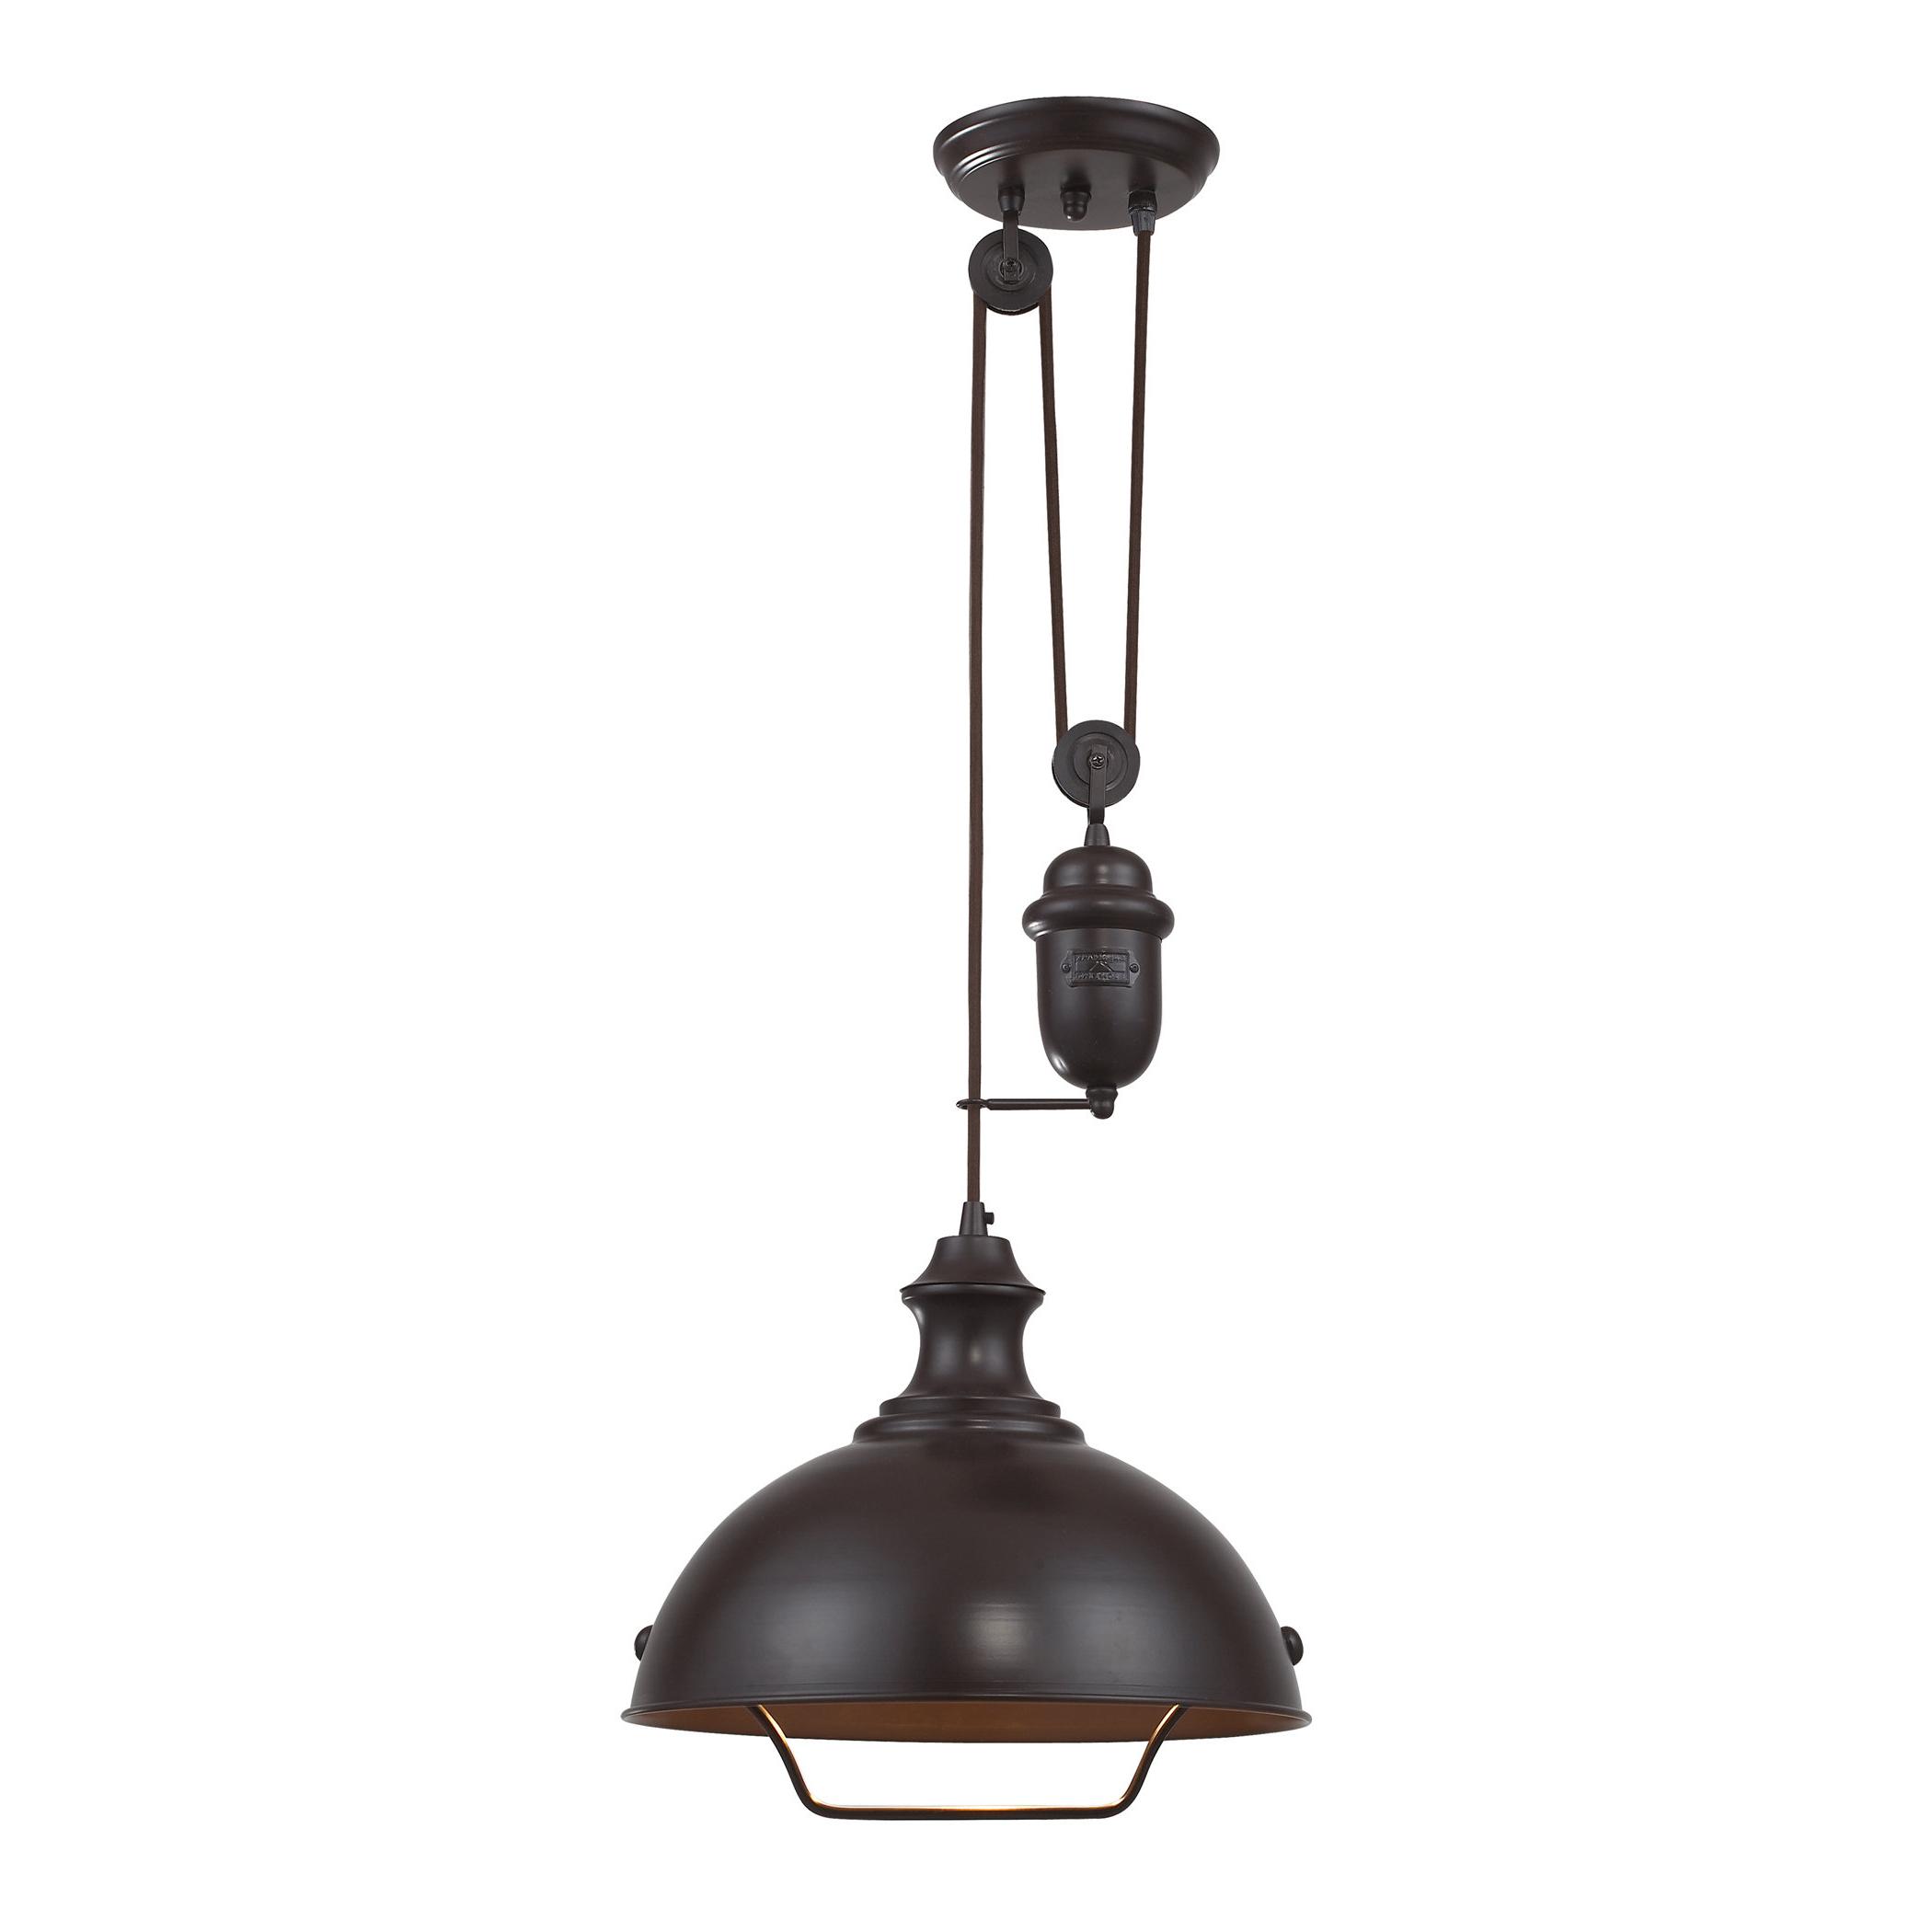 Current Legrand 1 Light Single Dome Pendant With Demi 1 Light Globe Pendants (View 5 of 20)